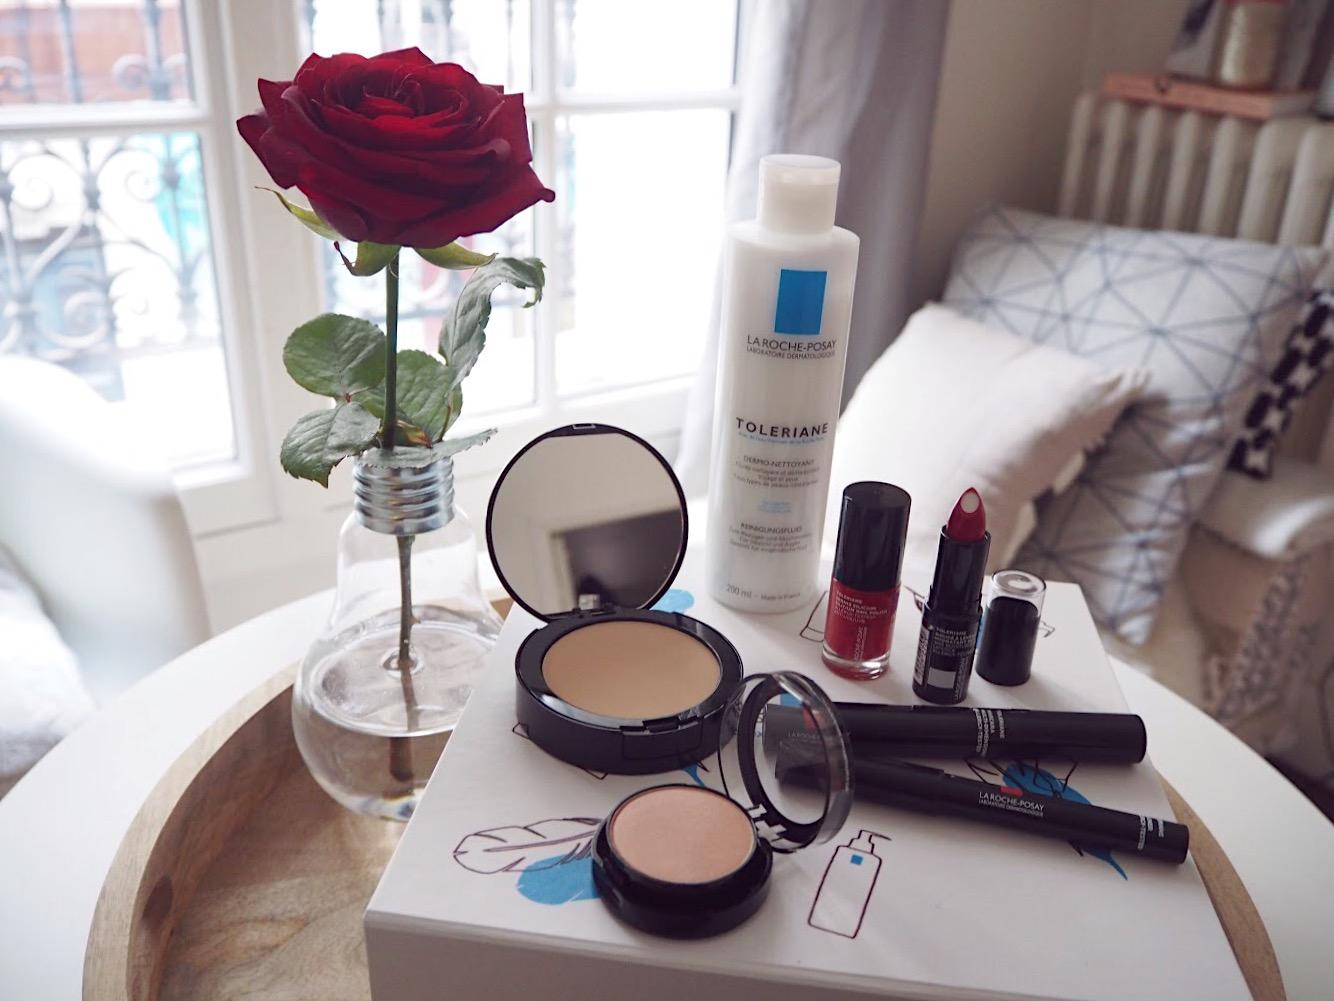 maquillage laroche-posay 2